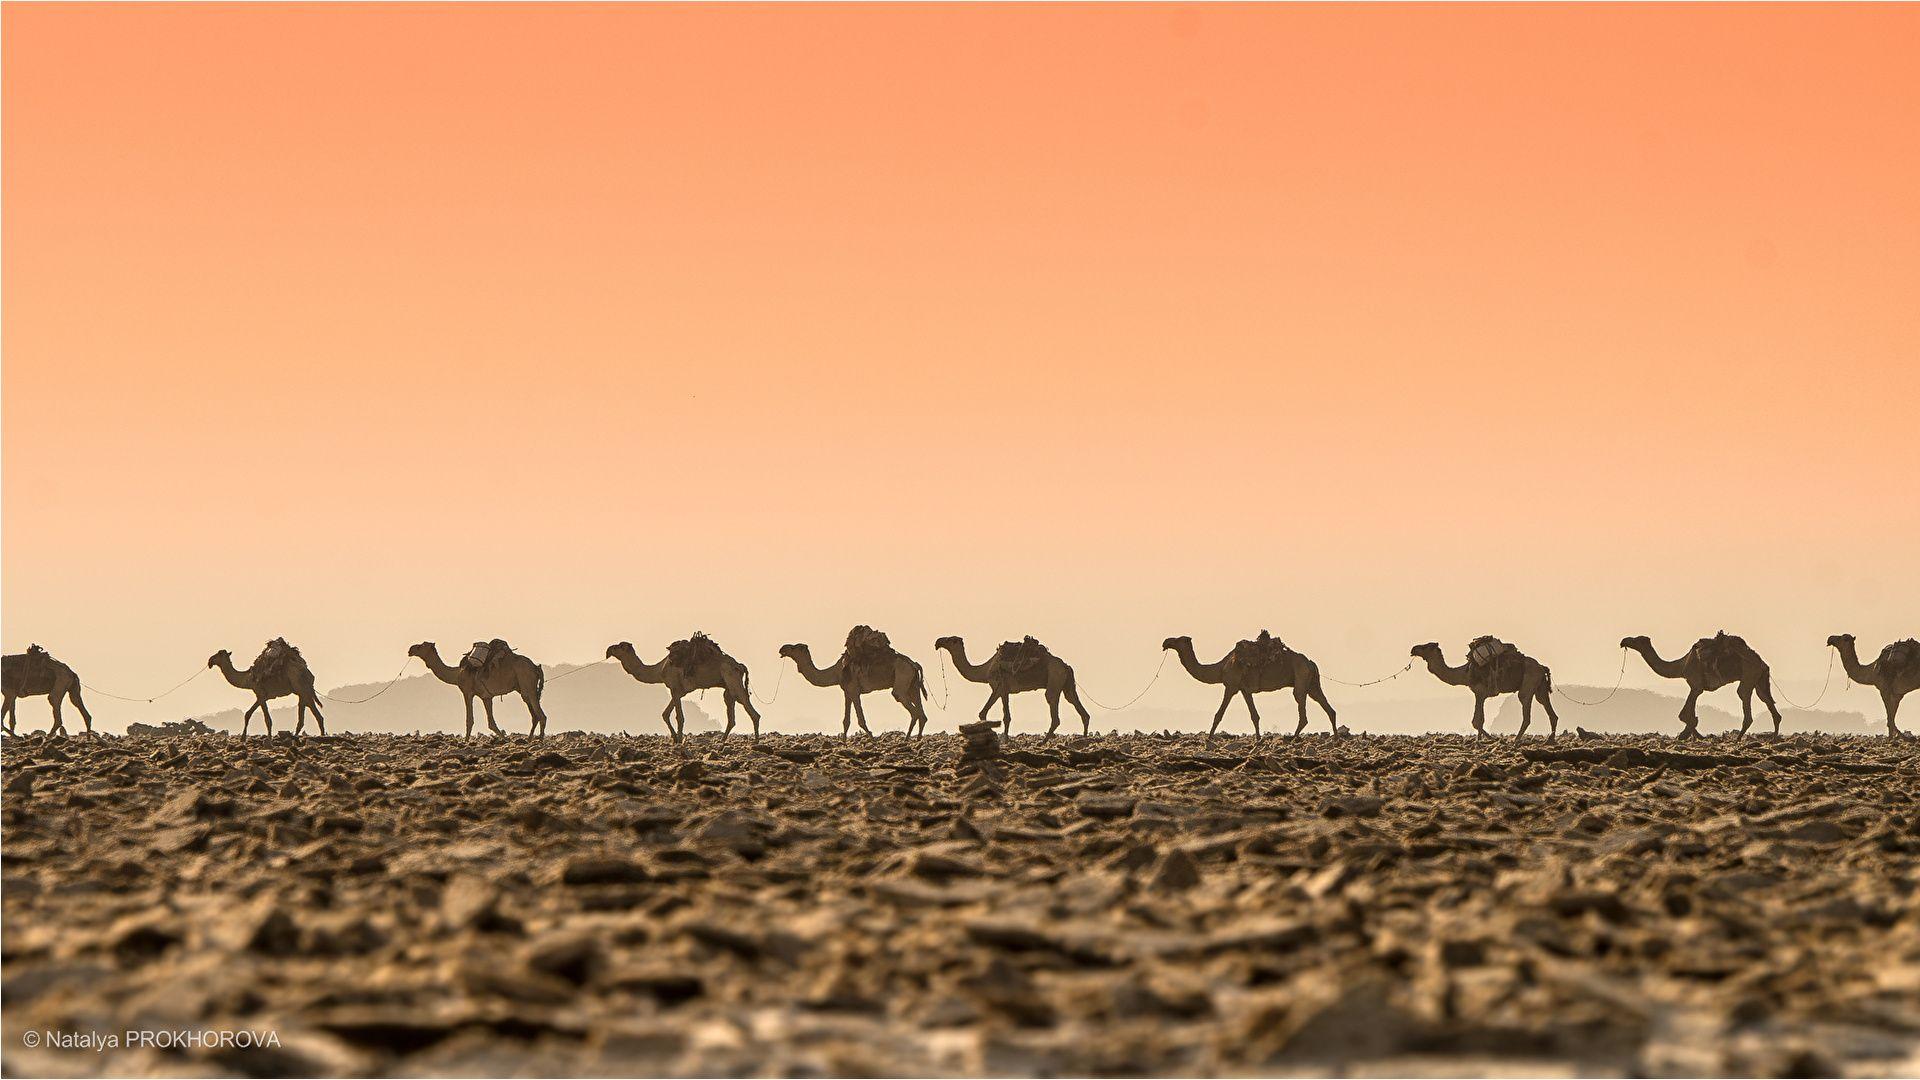 Camel Caravan In The Desert At Night